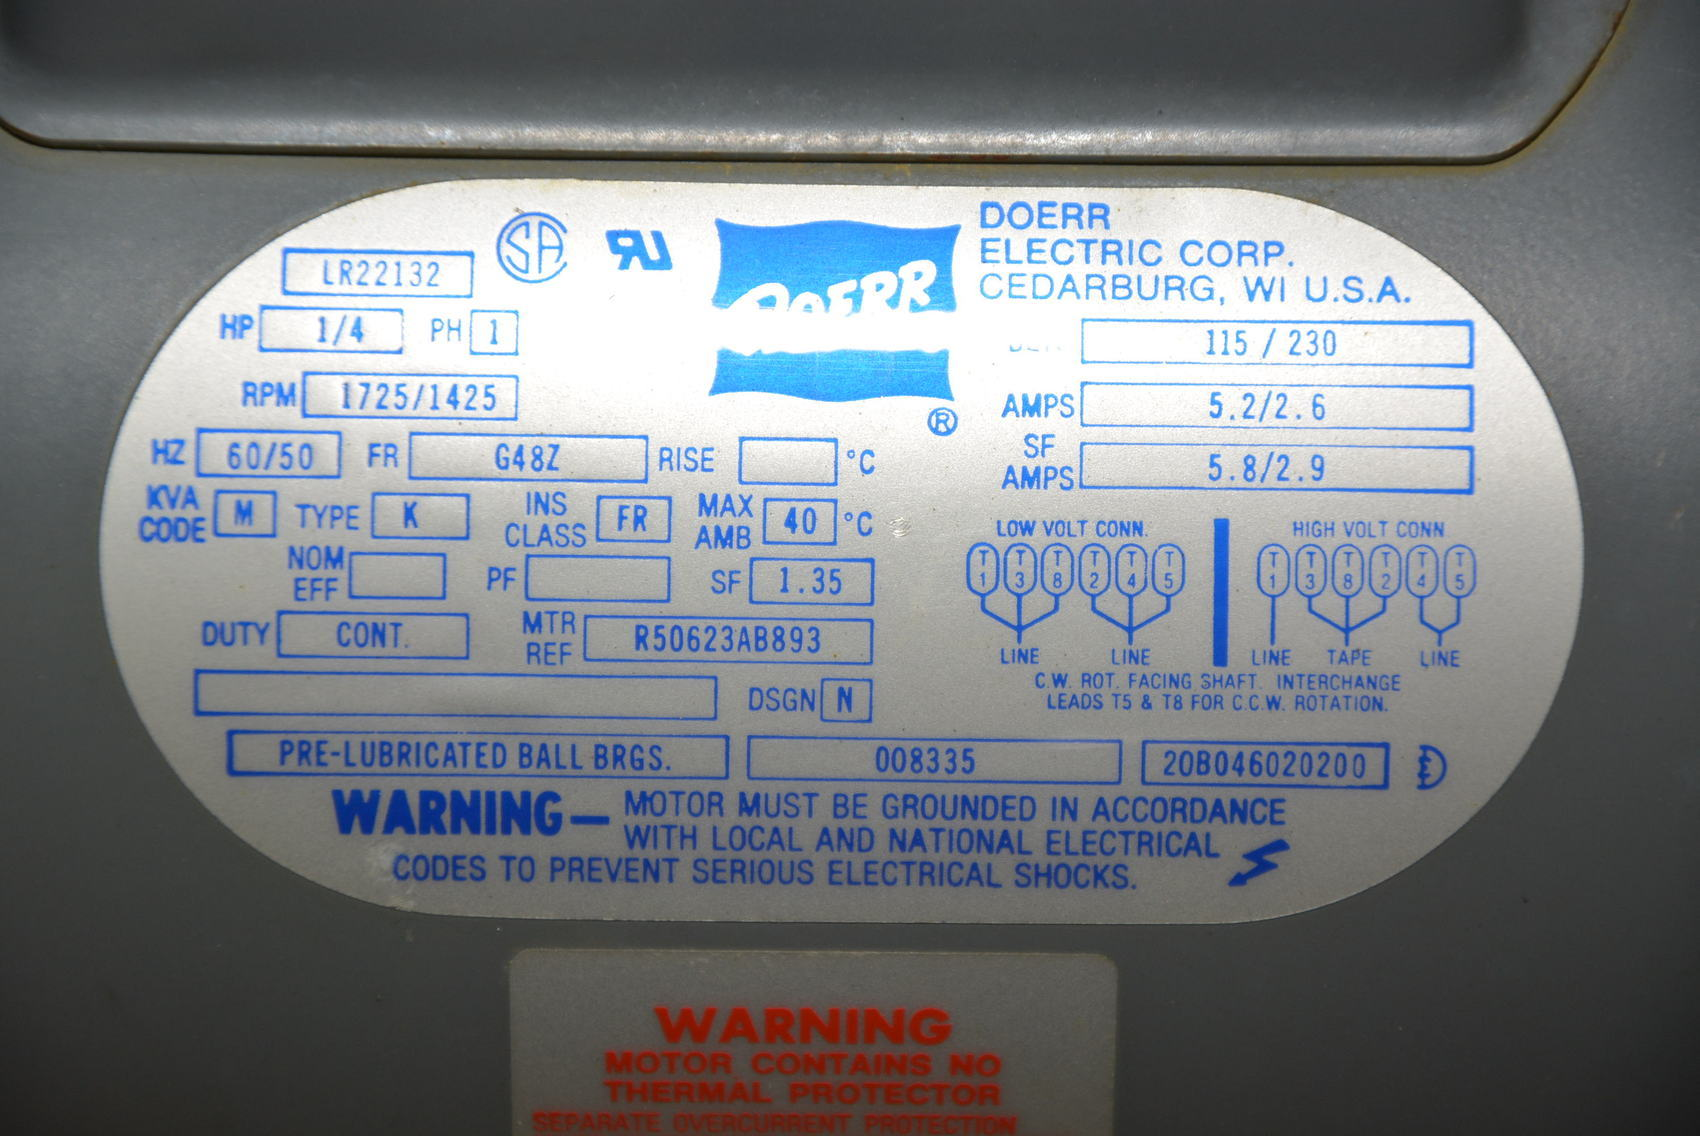 doerr electric motor wiring diagram humbucker pickup single phase blower lr22132 hp 1 4 volts 115 230 inv